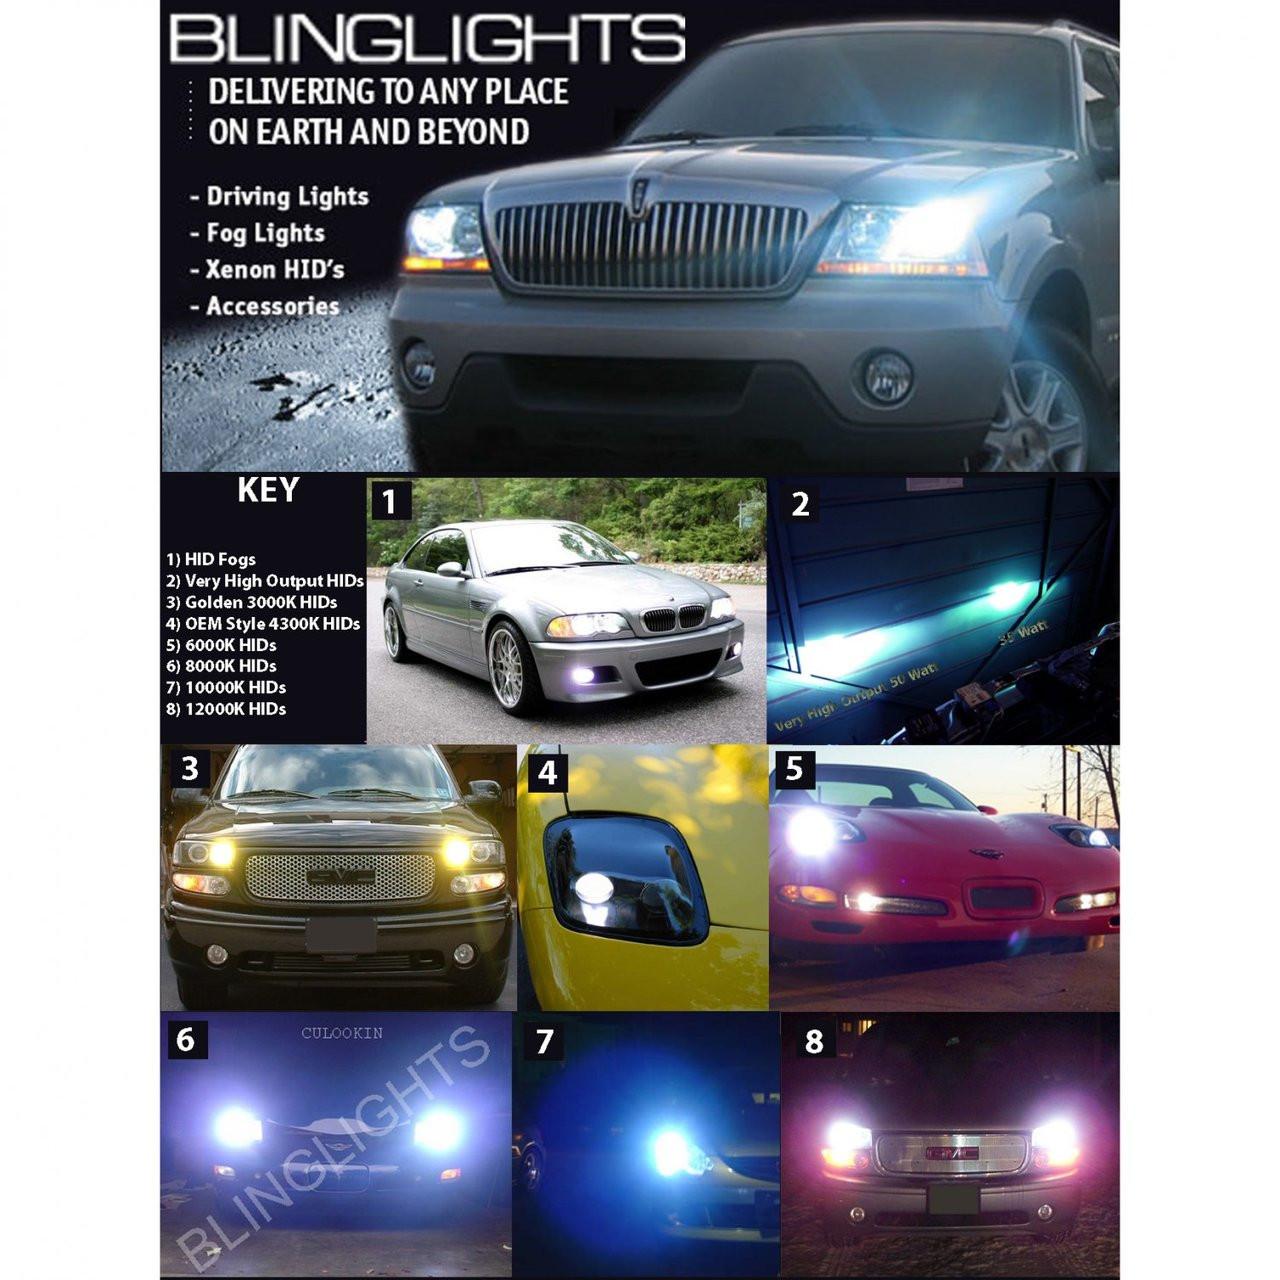 2002 2003 2004 2005 2006 2007 Jeep Liberty KJ Xenon 55watt HID Headlamps Headlights Conversion Kit